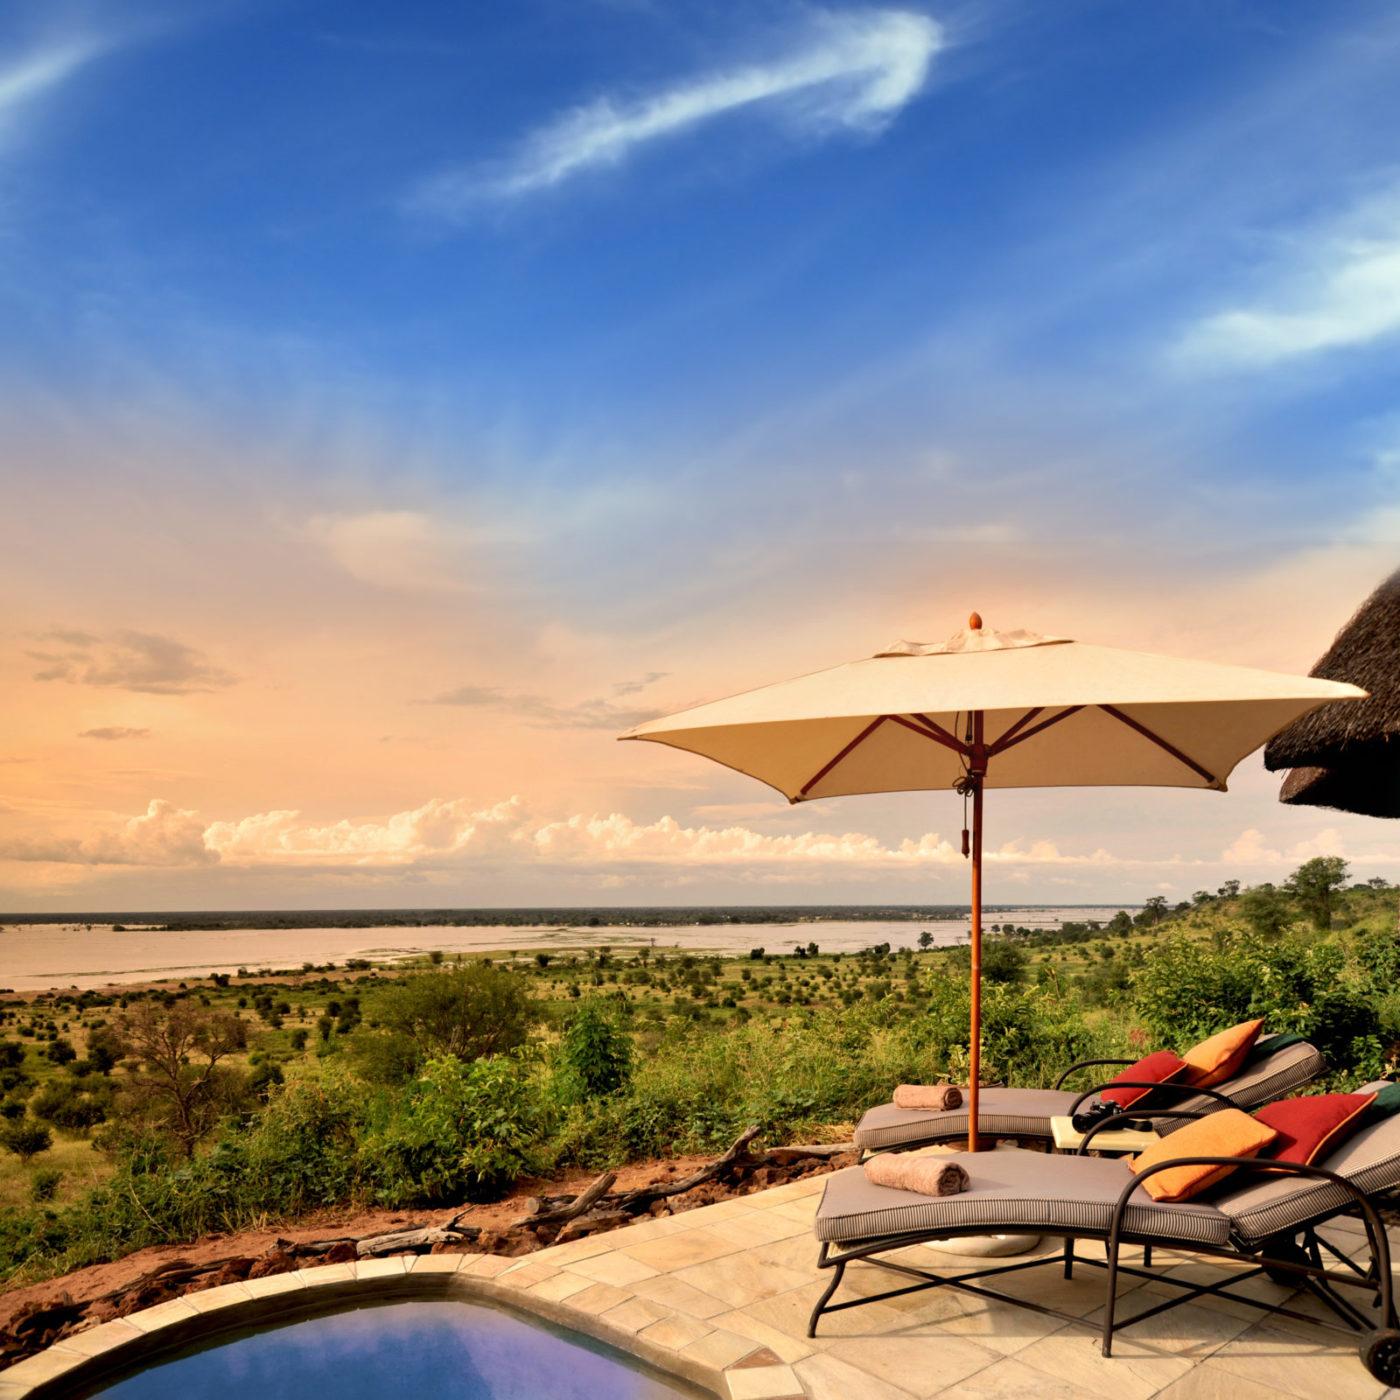 Plunge pool with a view at Ngoma Safari Lodge